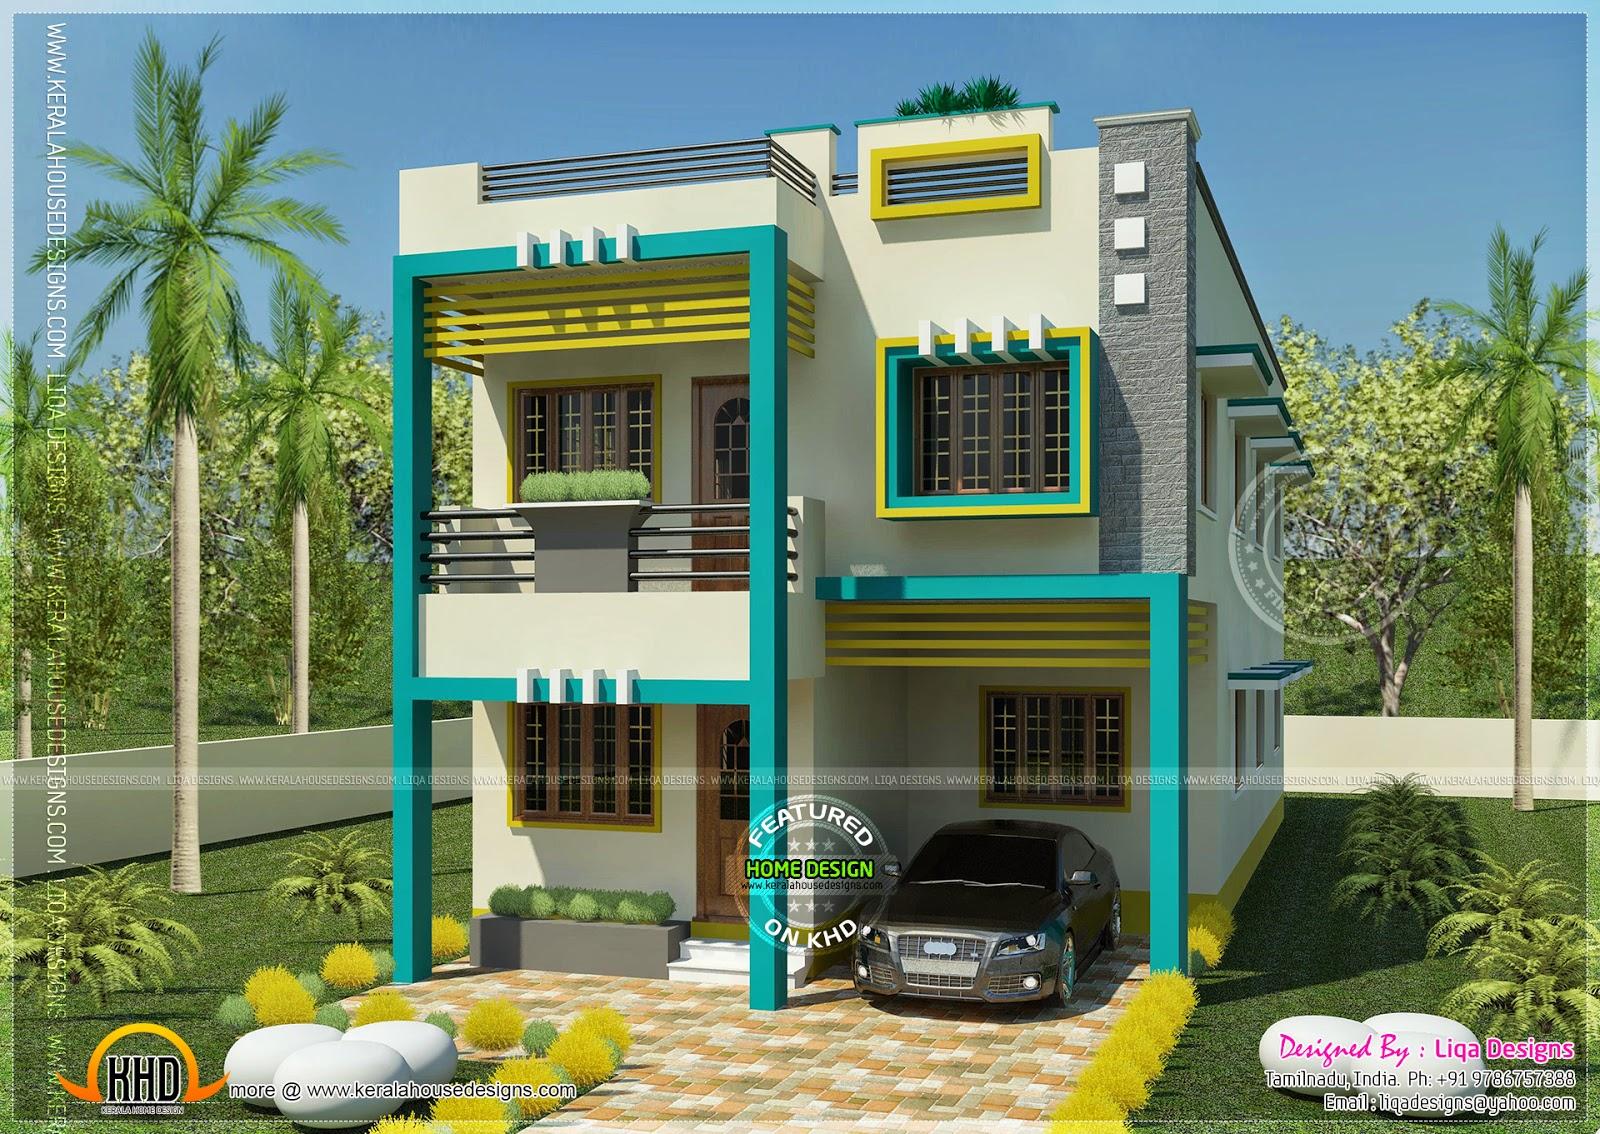 House Building Plans In Tamilnadu | Amazing House Plans